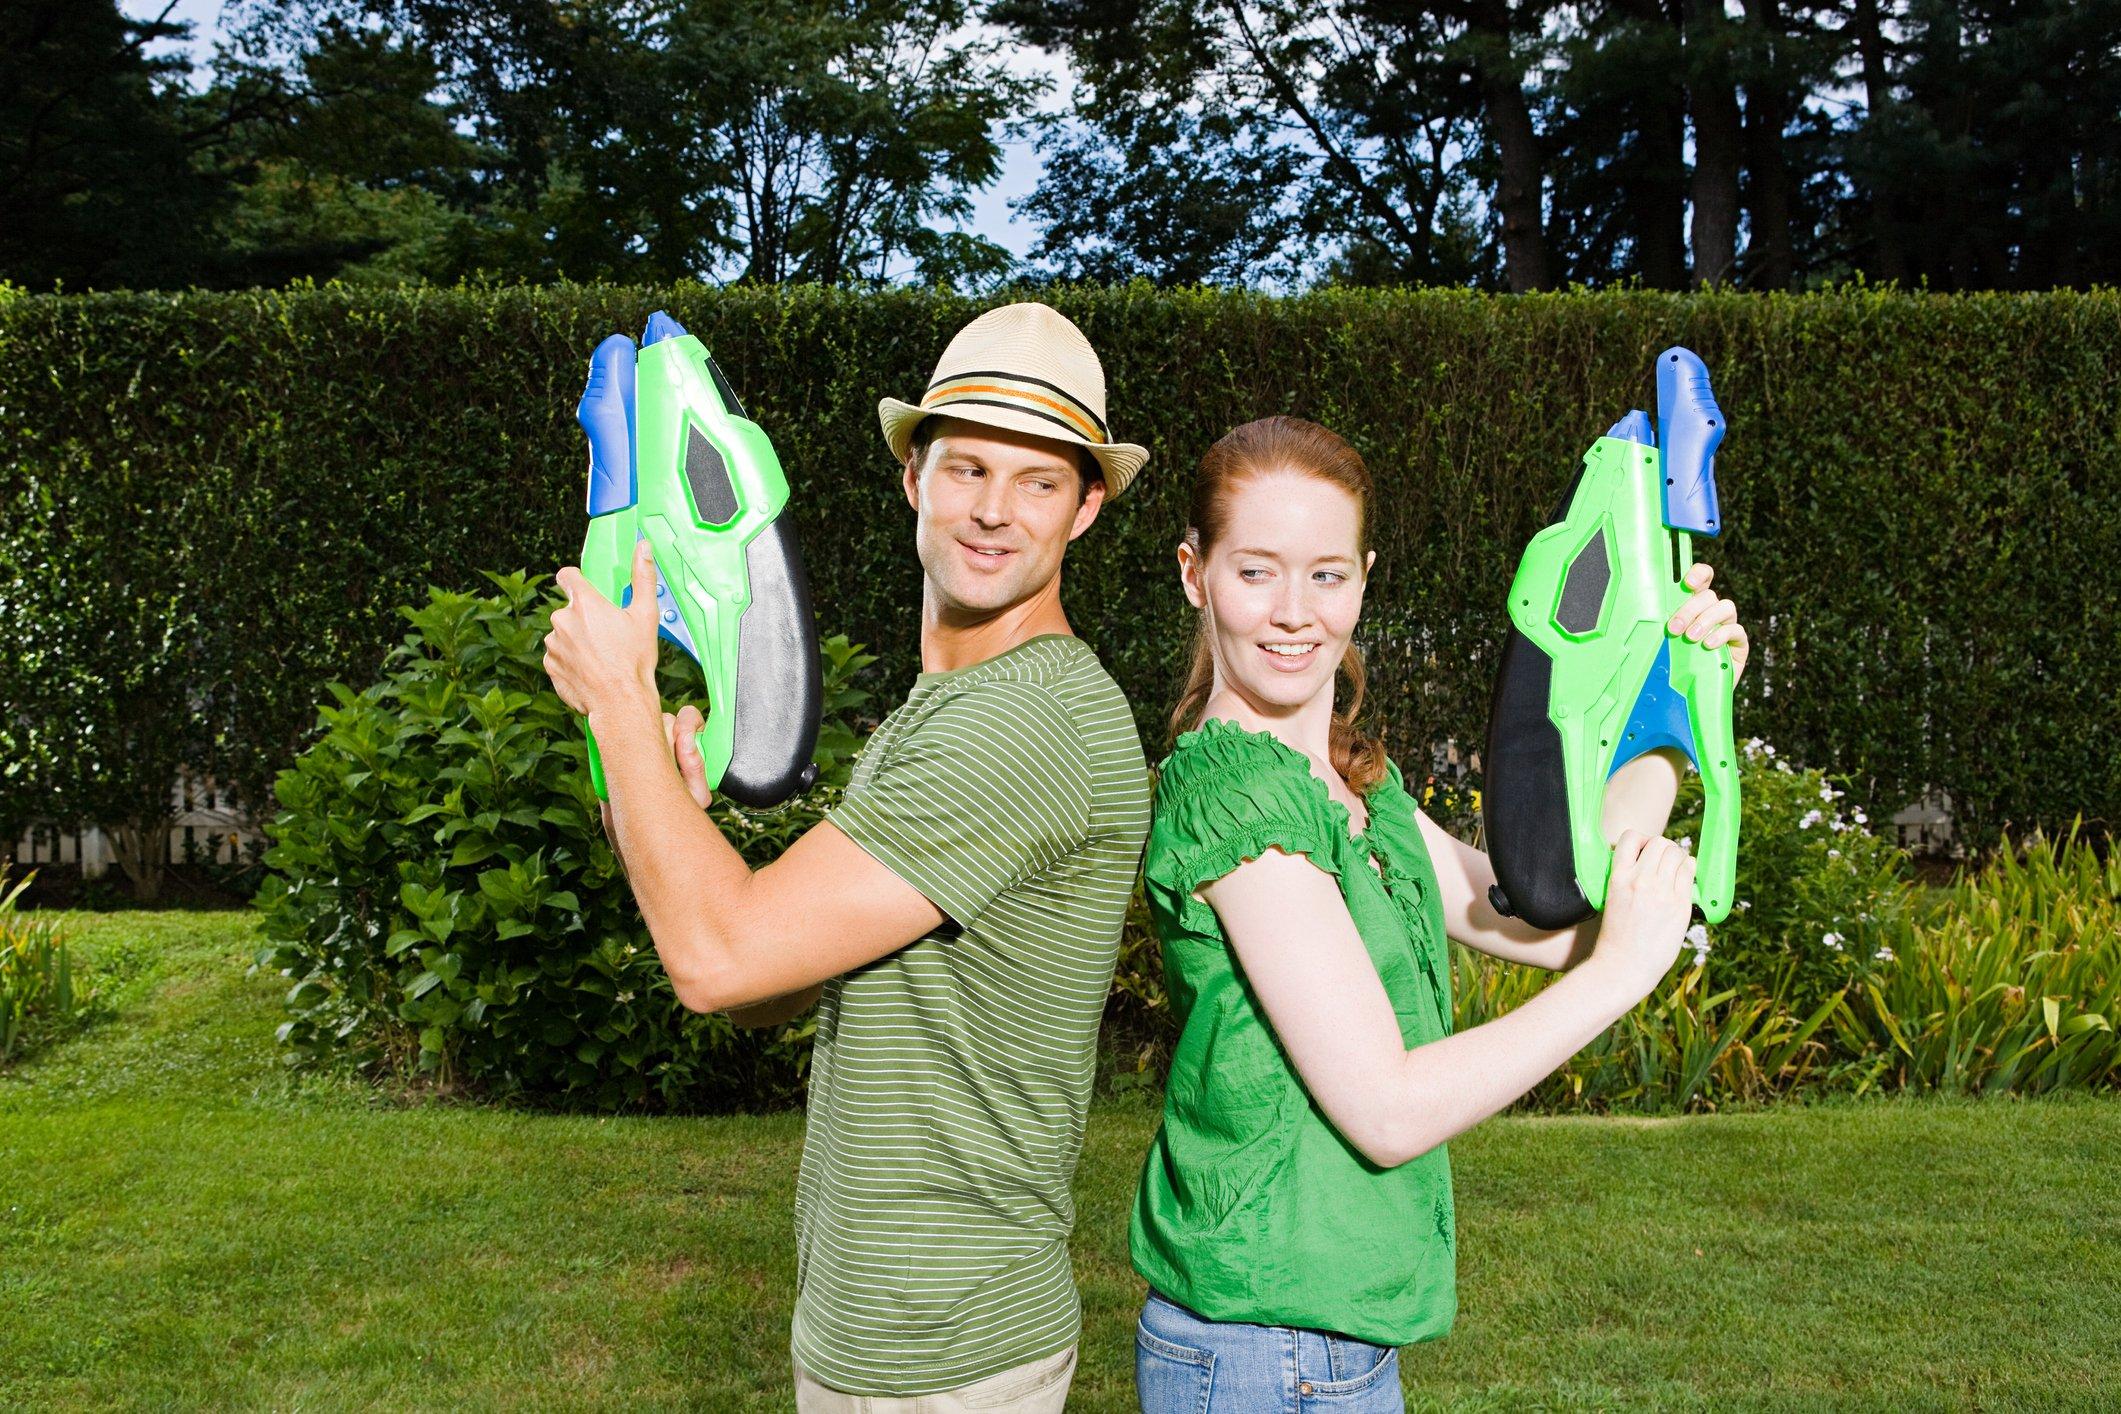 Couple playfully having summer fun